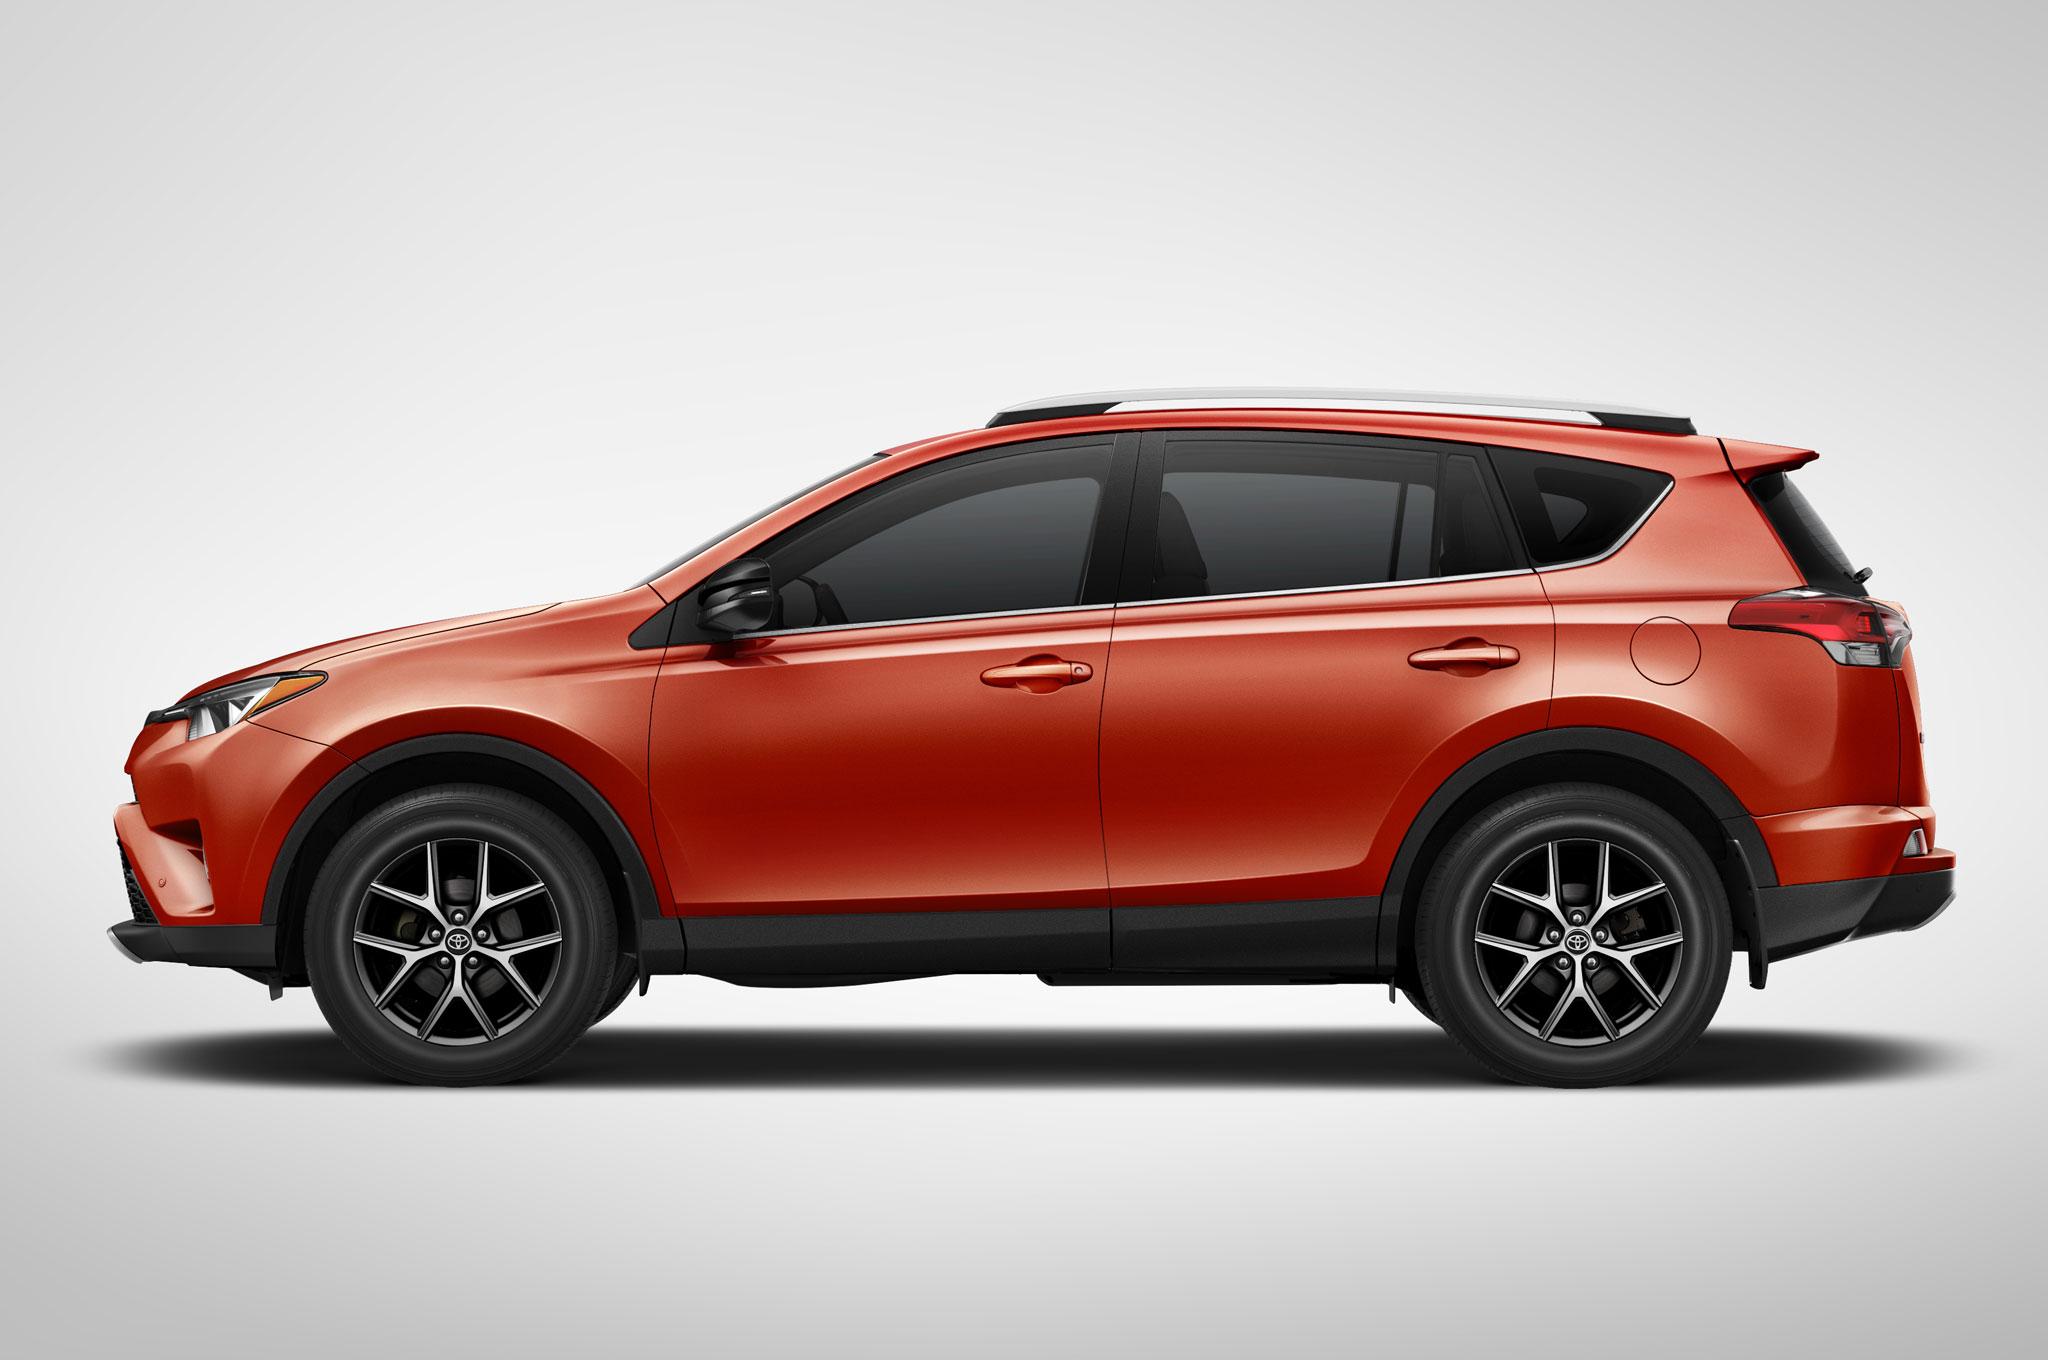 2016 Toyota Rav4 Side Profile